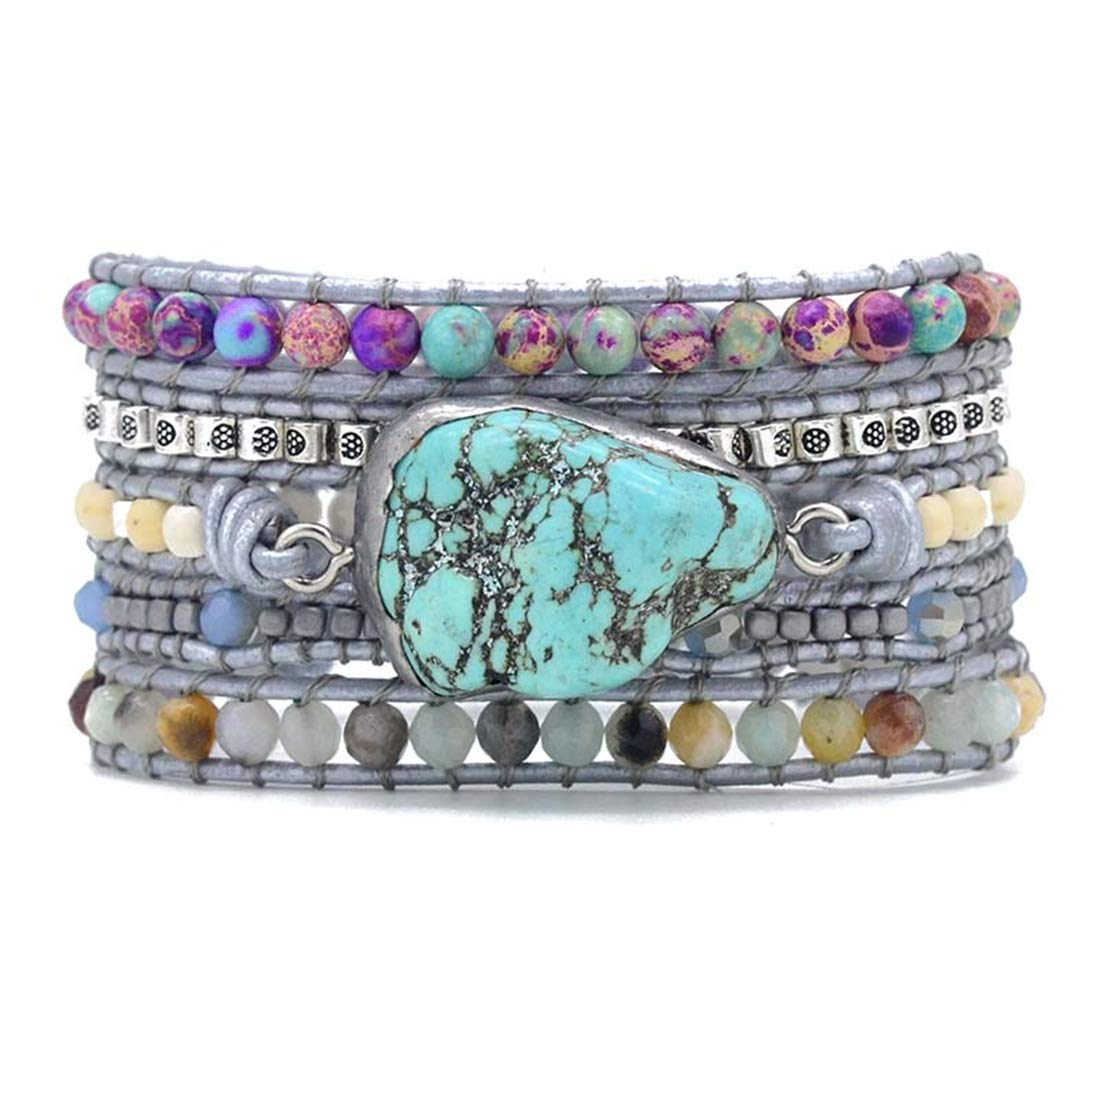 YGLINE Handmade Wrap Bracelet Turquoise, Jasper & Amazonite Natural Stones Leather Charm 5 Strands Boho Bracelet